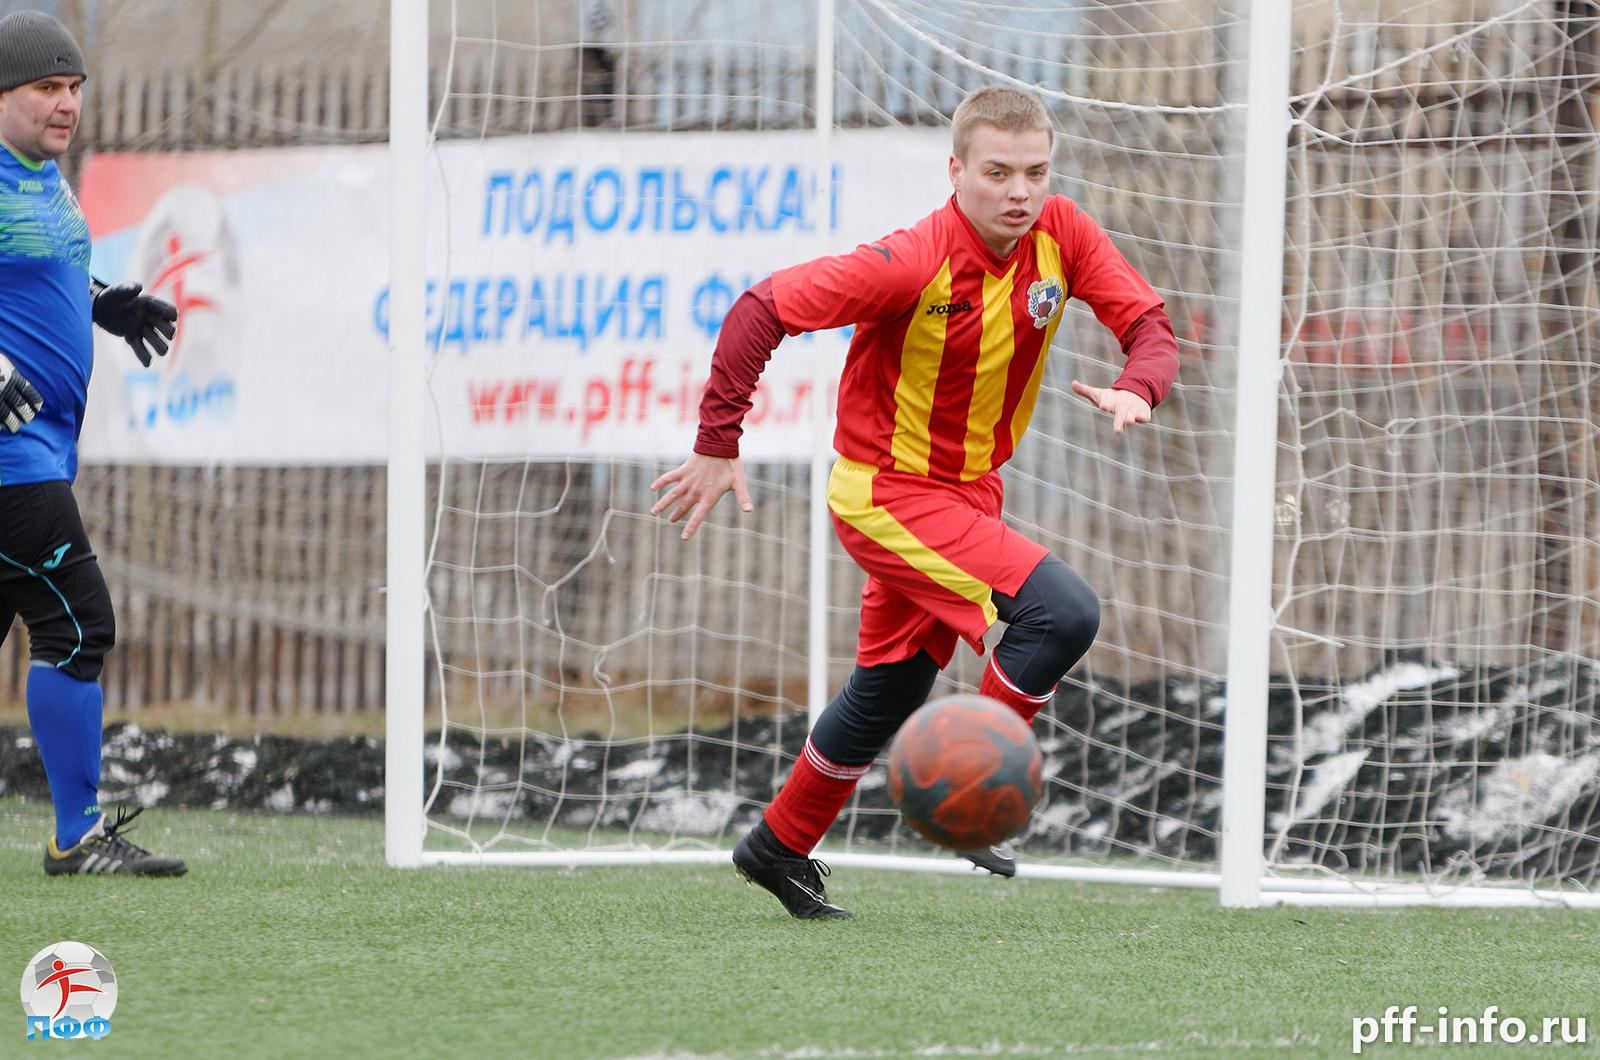 Премьер-лига ТДК. 1 тур. Матч тура